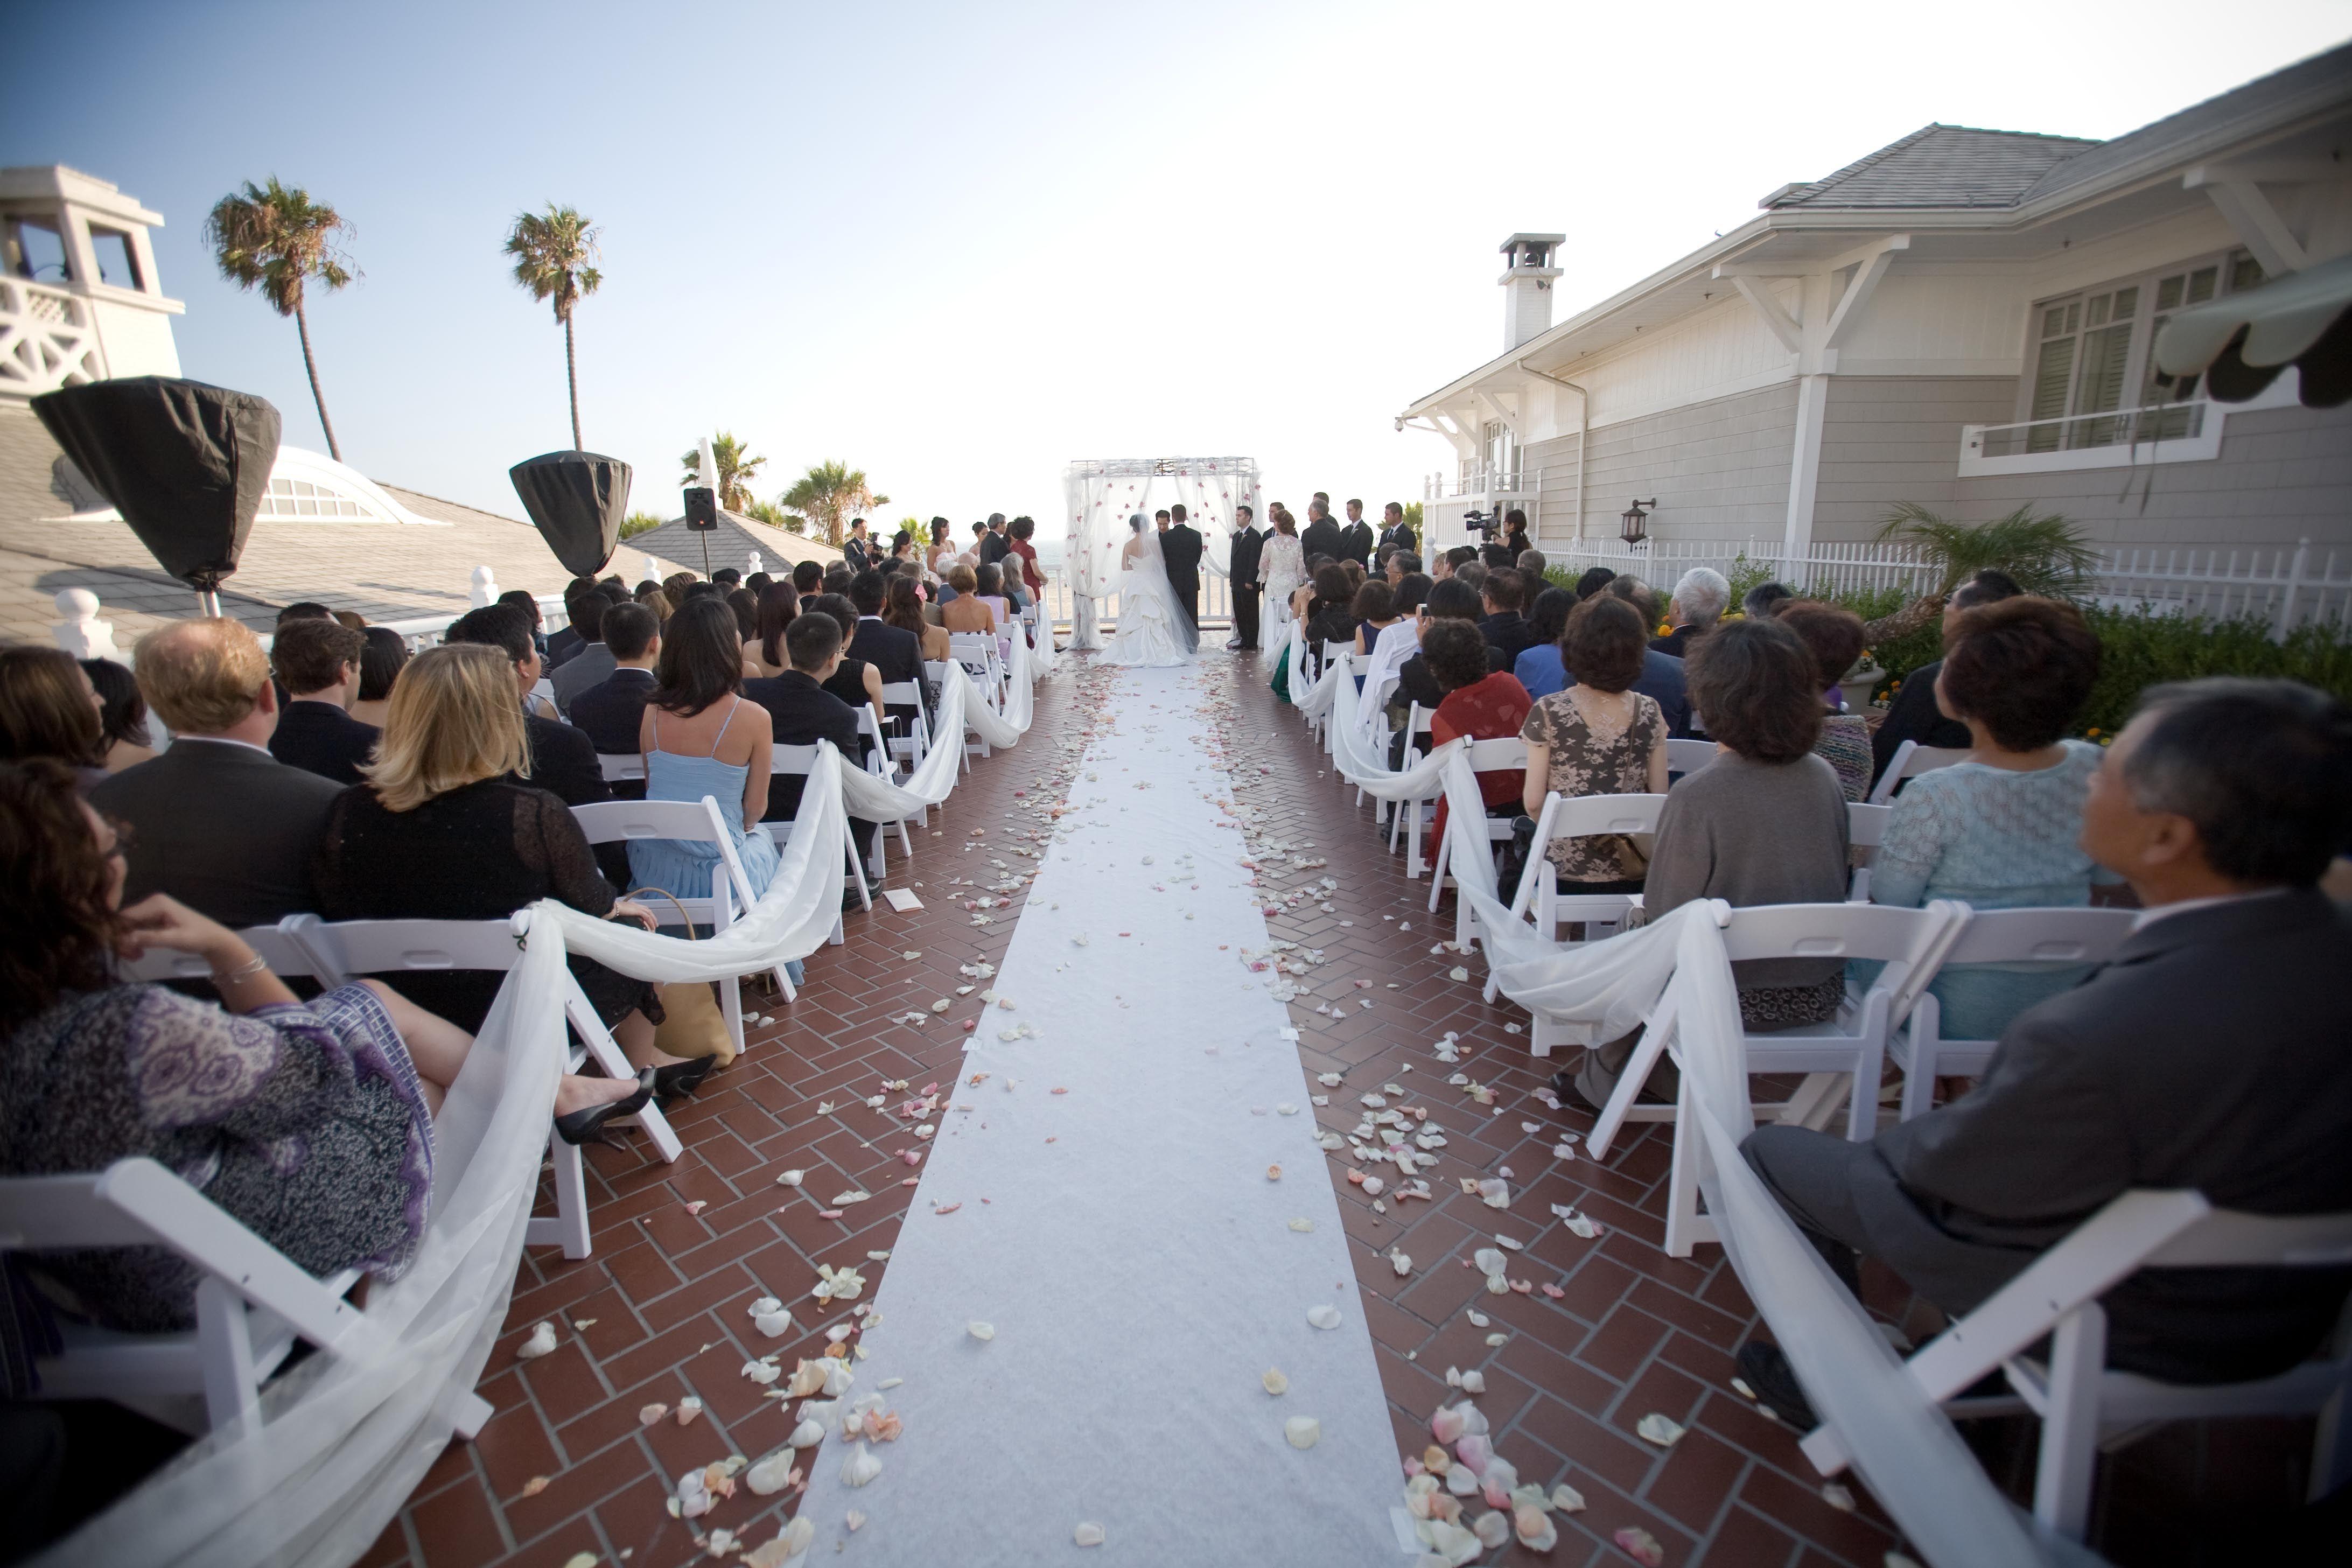 Terrace Wedding At Luxury Hotel Shutters On The Beach Santa Monica California